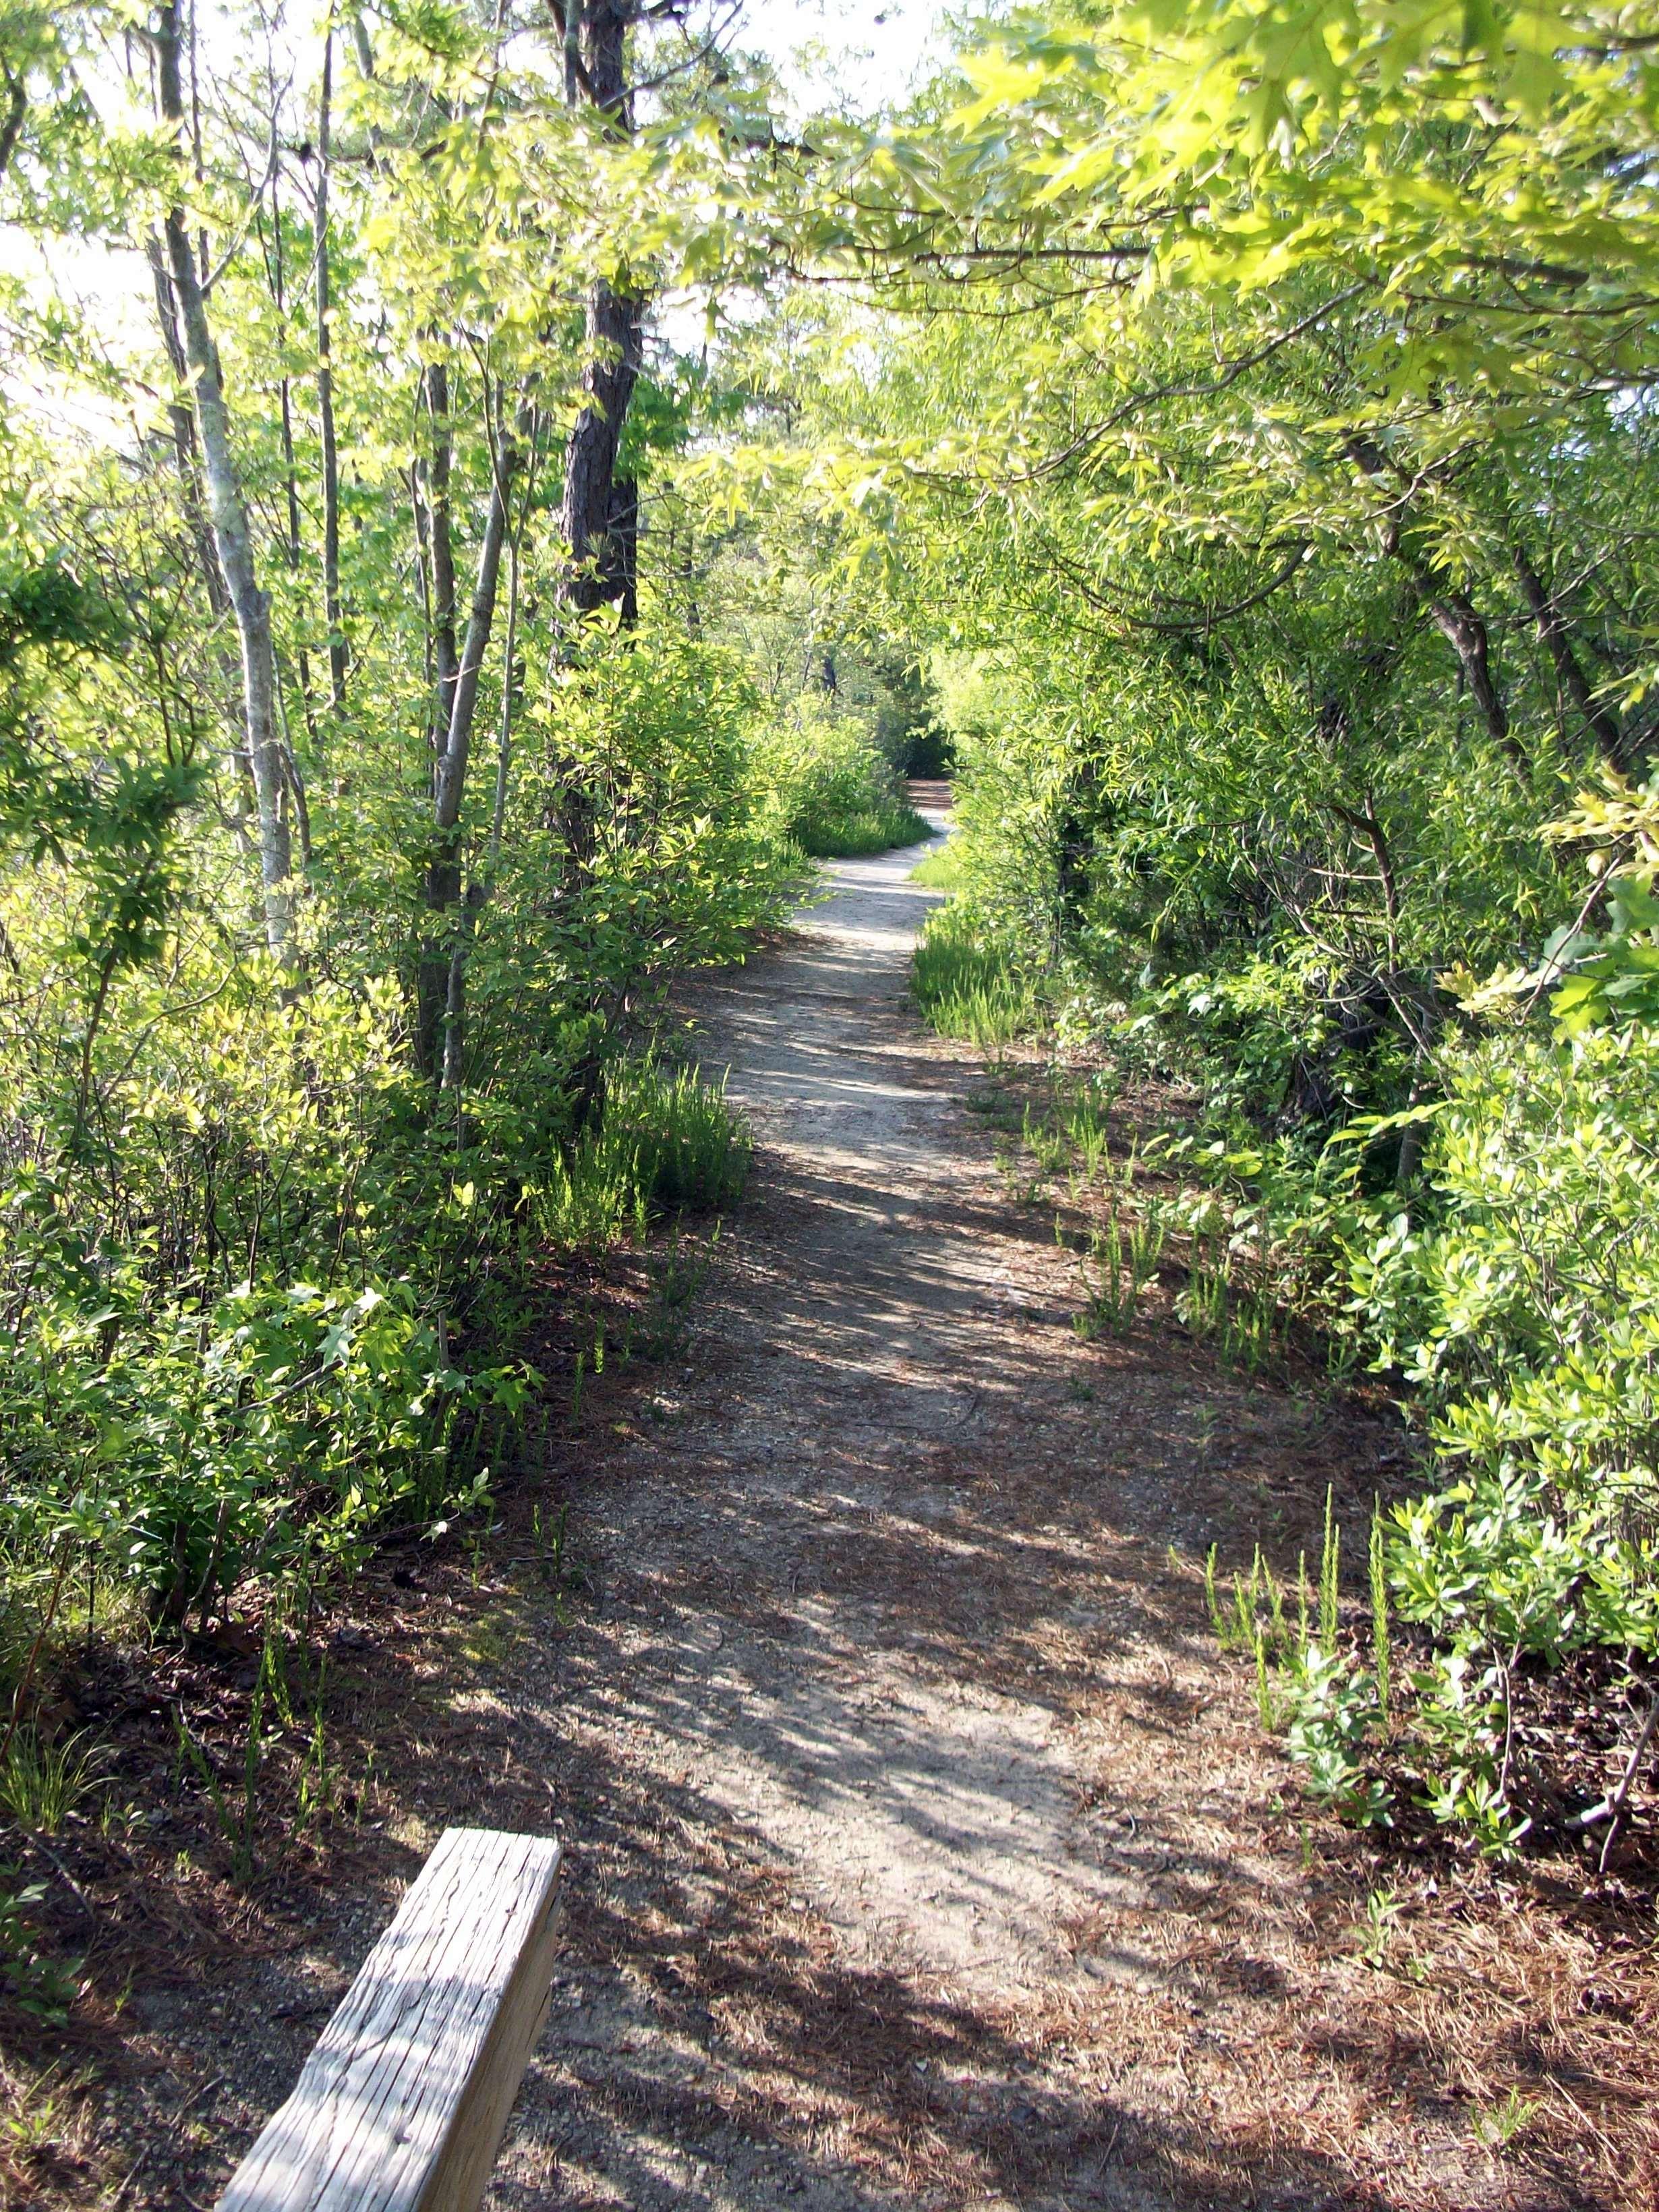 Woods Trail, Walking, Woods, Trails, Trail, HQ Photo